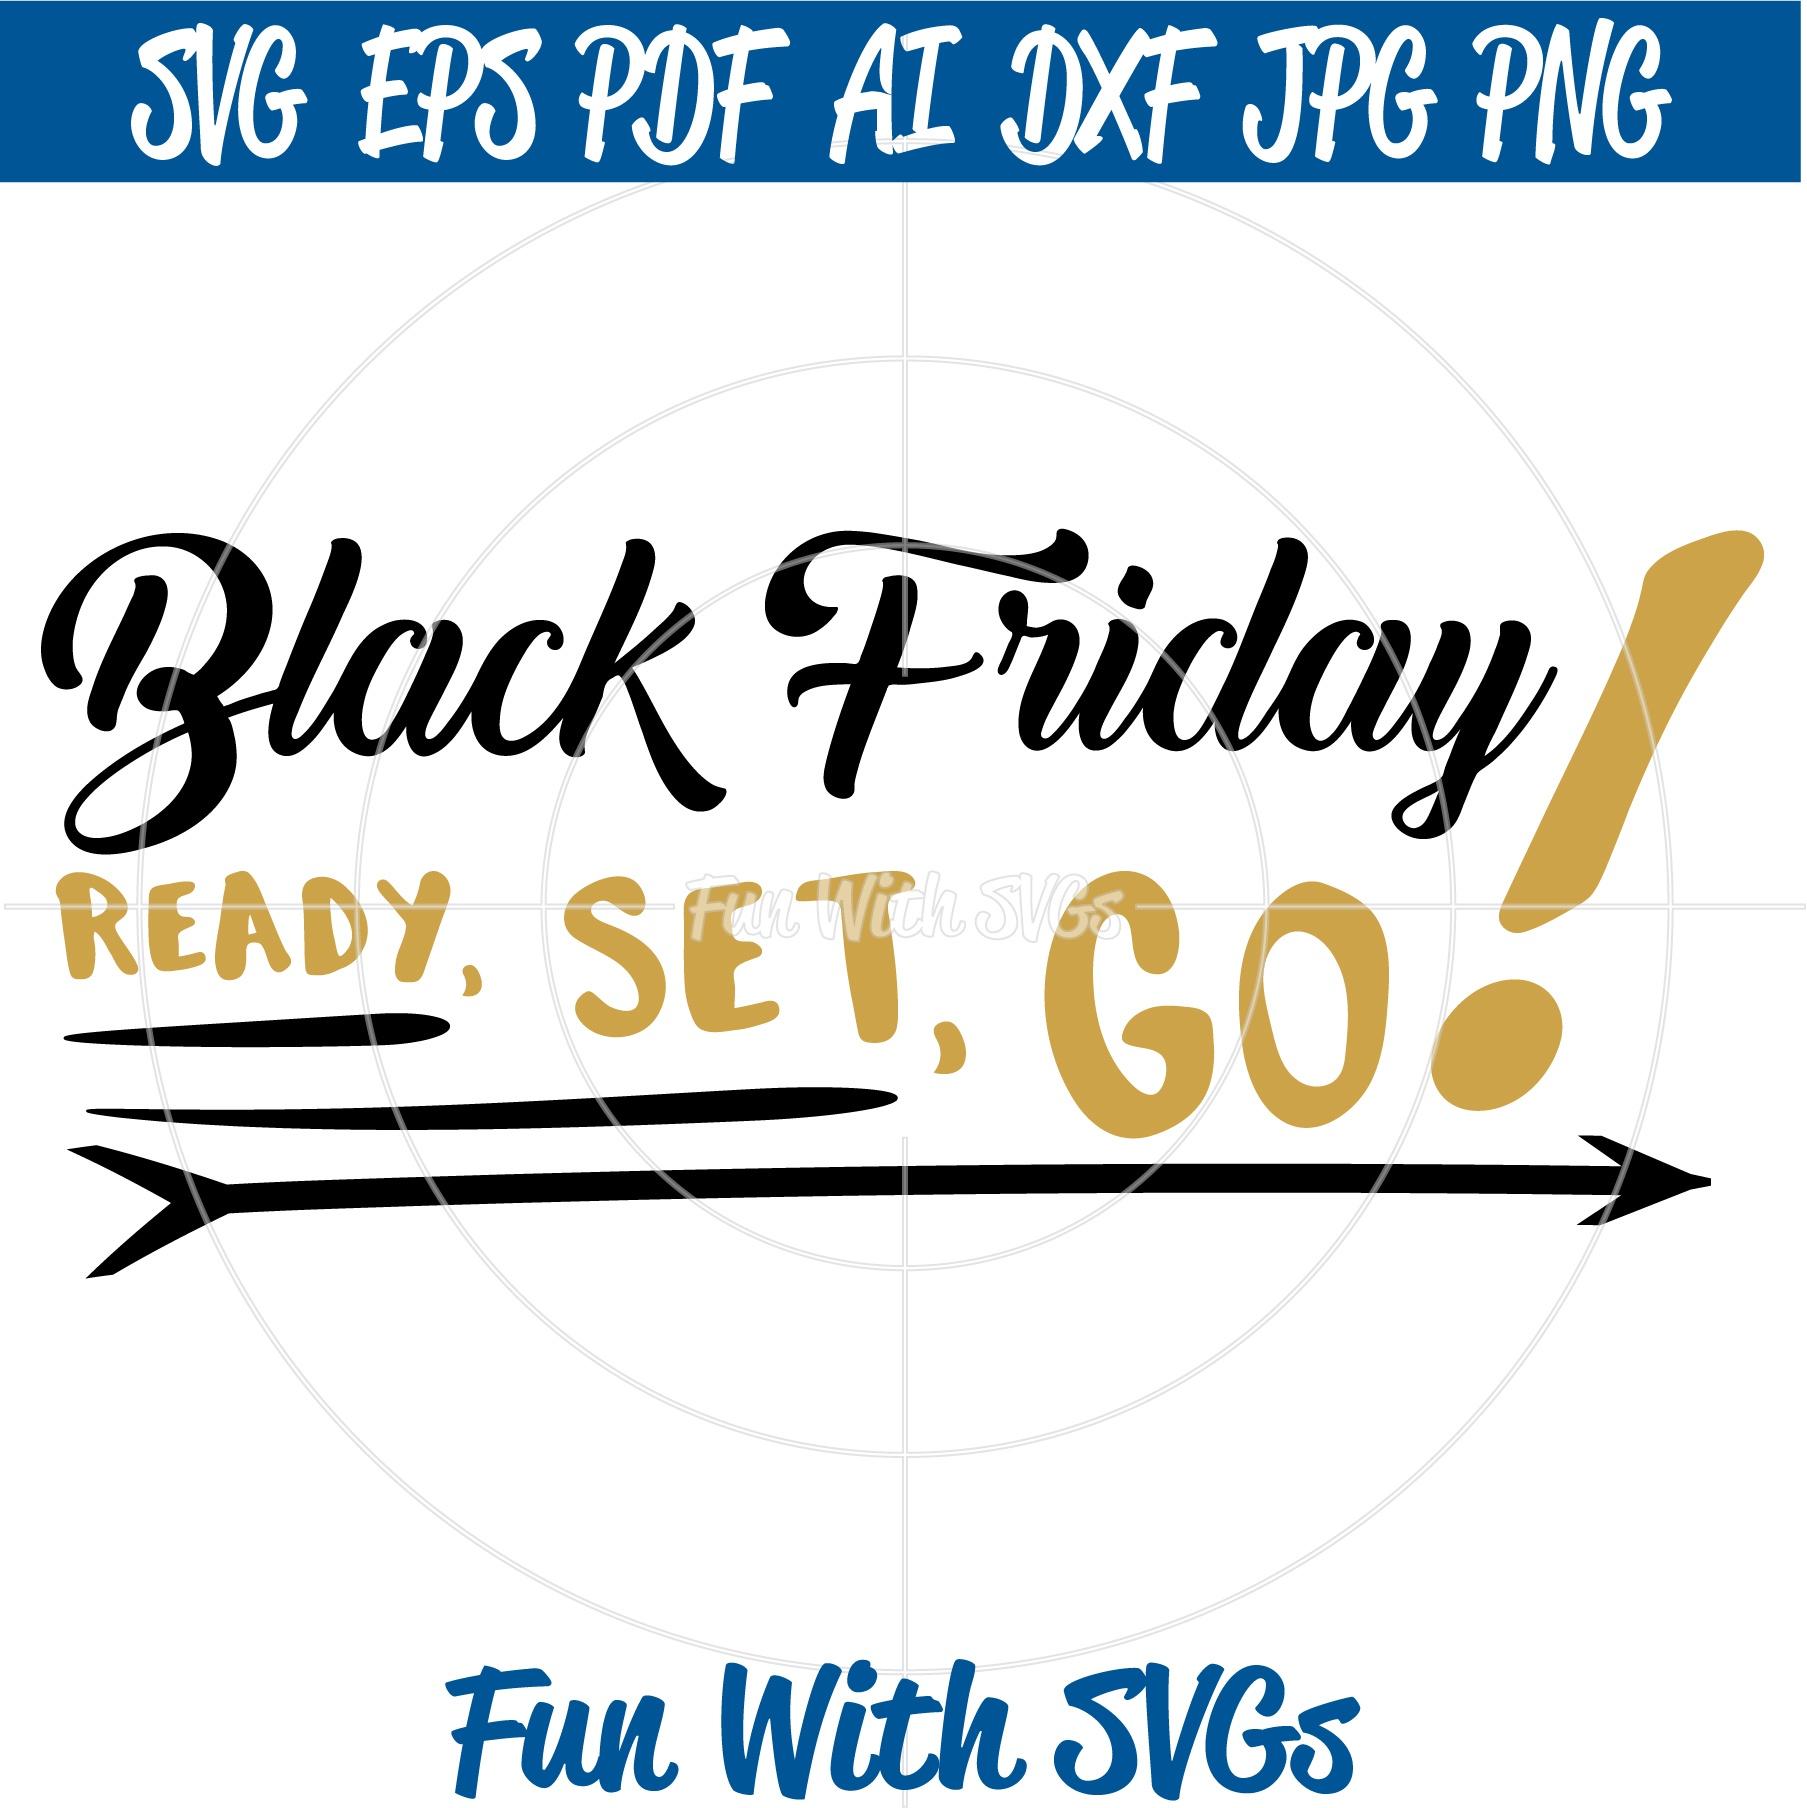 Black Friday T-shirt Ideas, SVG, PNG, EPS, DXF, Digital File, Ready, Set, Go